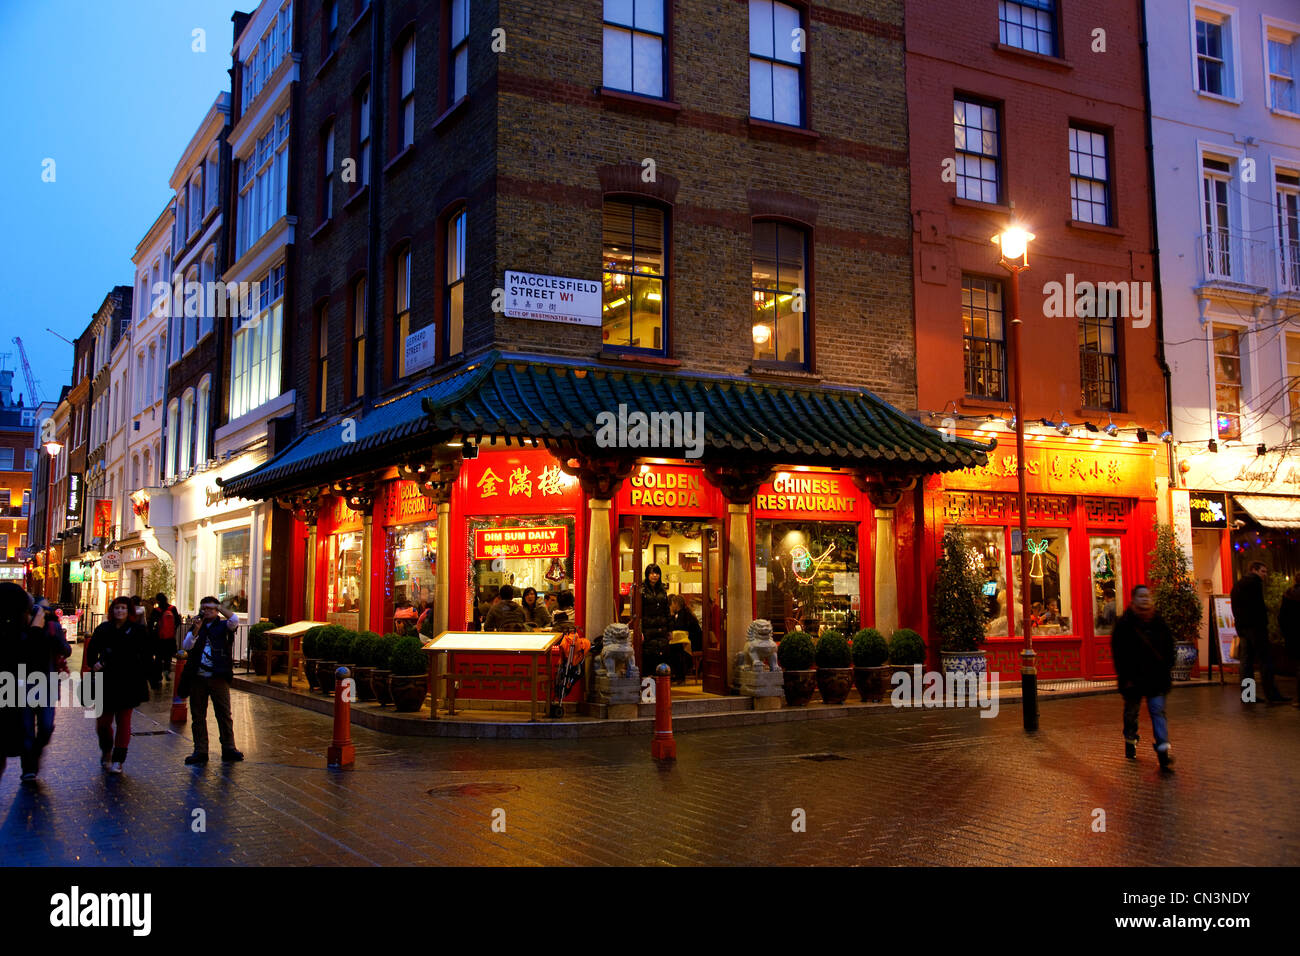 United Kingdom, London, Soho, Chinatown, floodlit facade of a Chinese restaurant Stock Photo